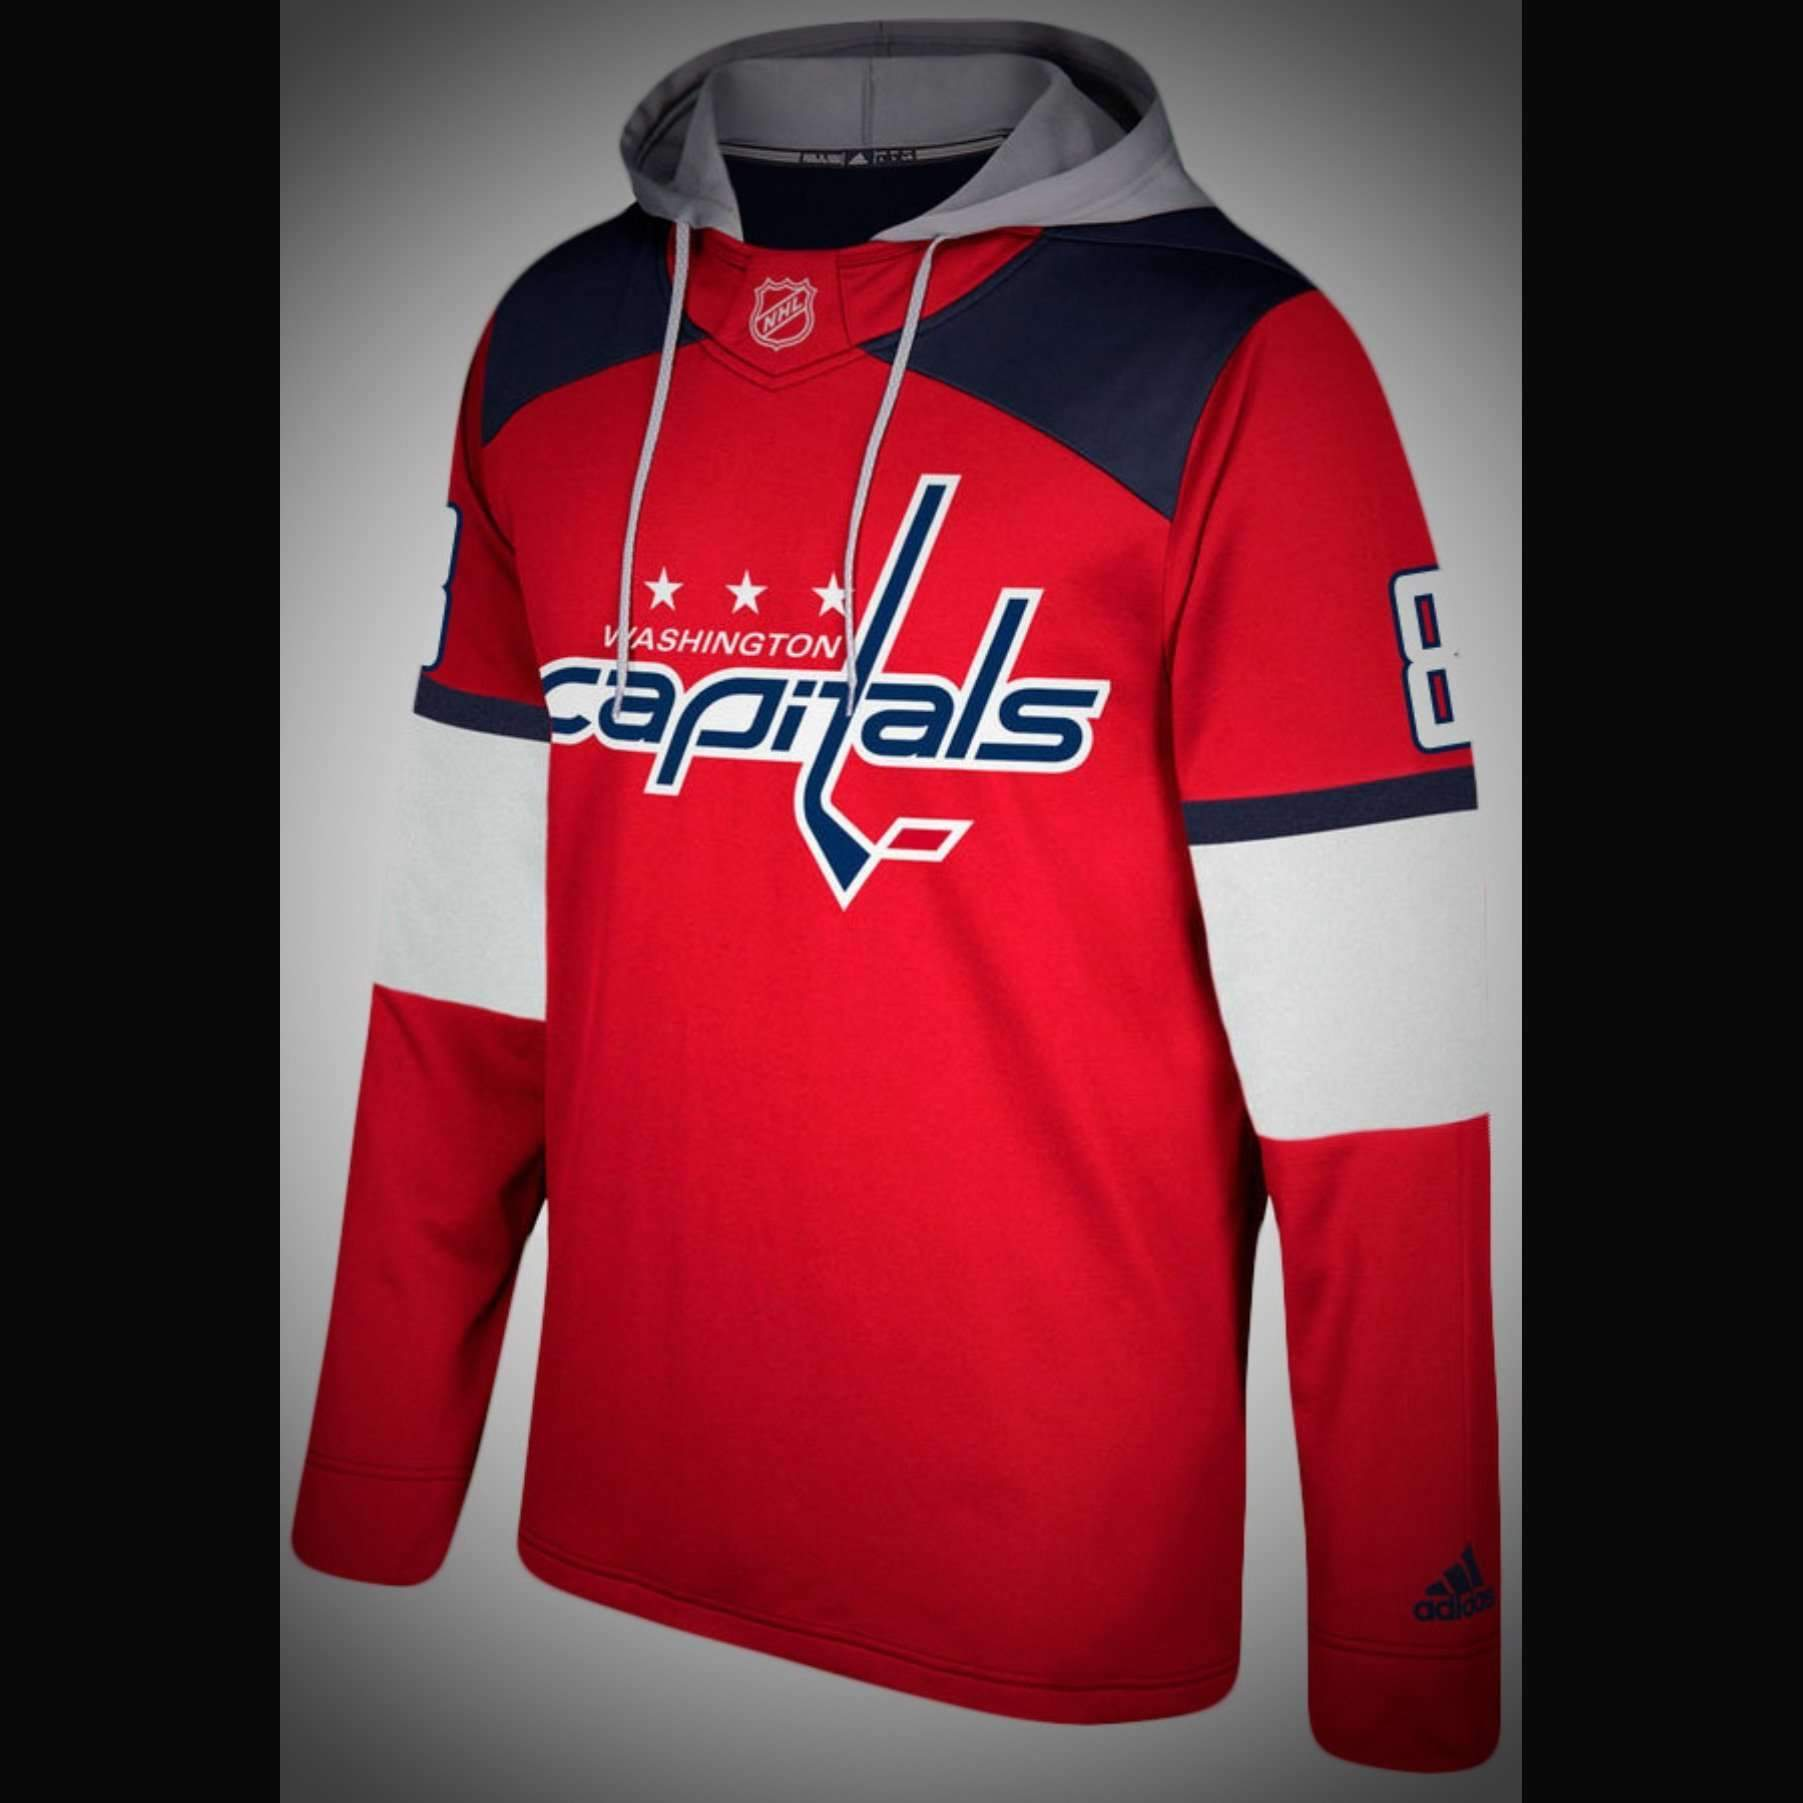 Washington Capitals Adidas NHL Hockey Jersey Style Hoodie  http   jerseybarn.com  a9722008c